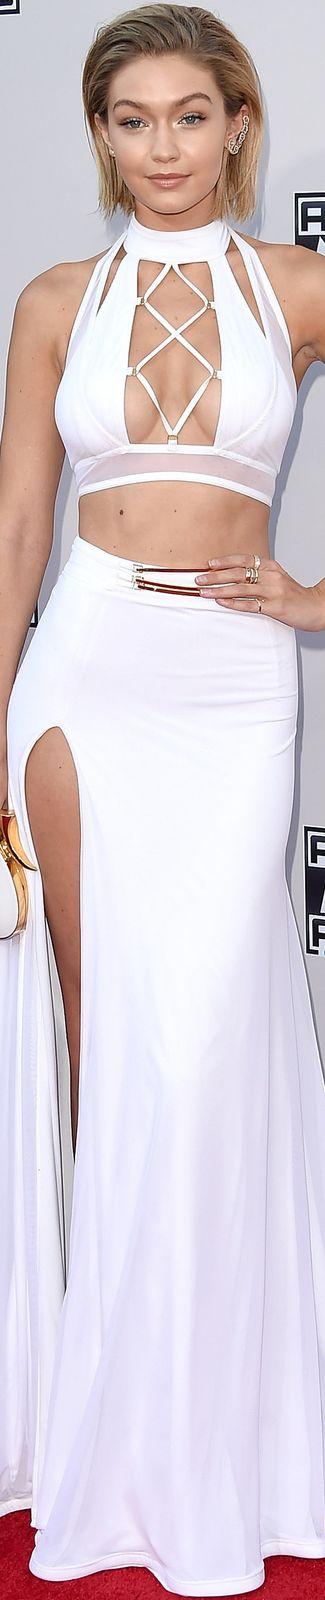 Gigi Hadid 2015 American Music Awards